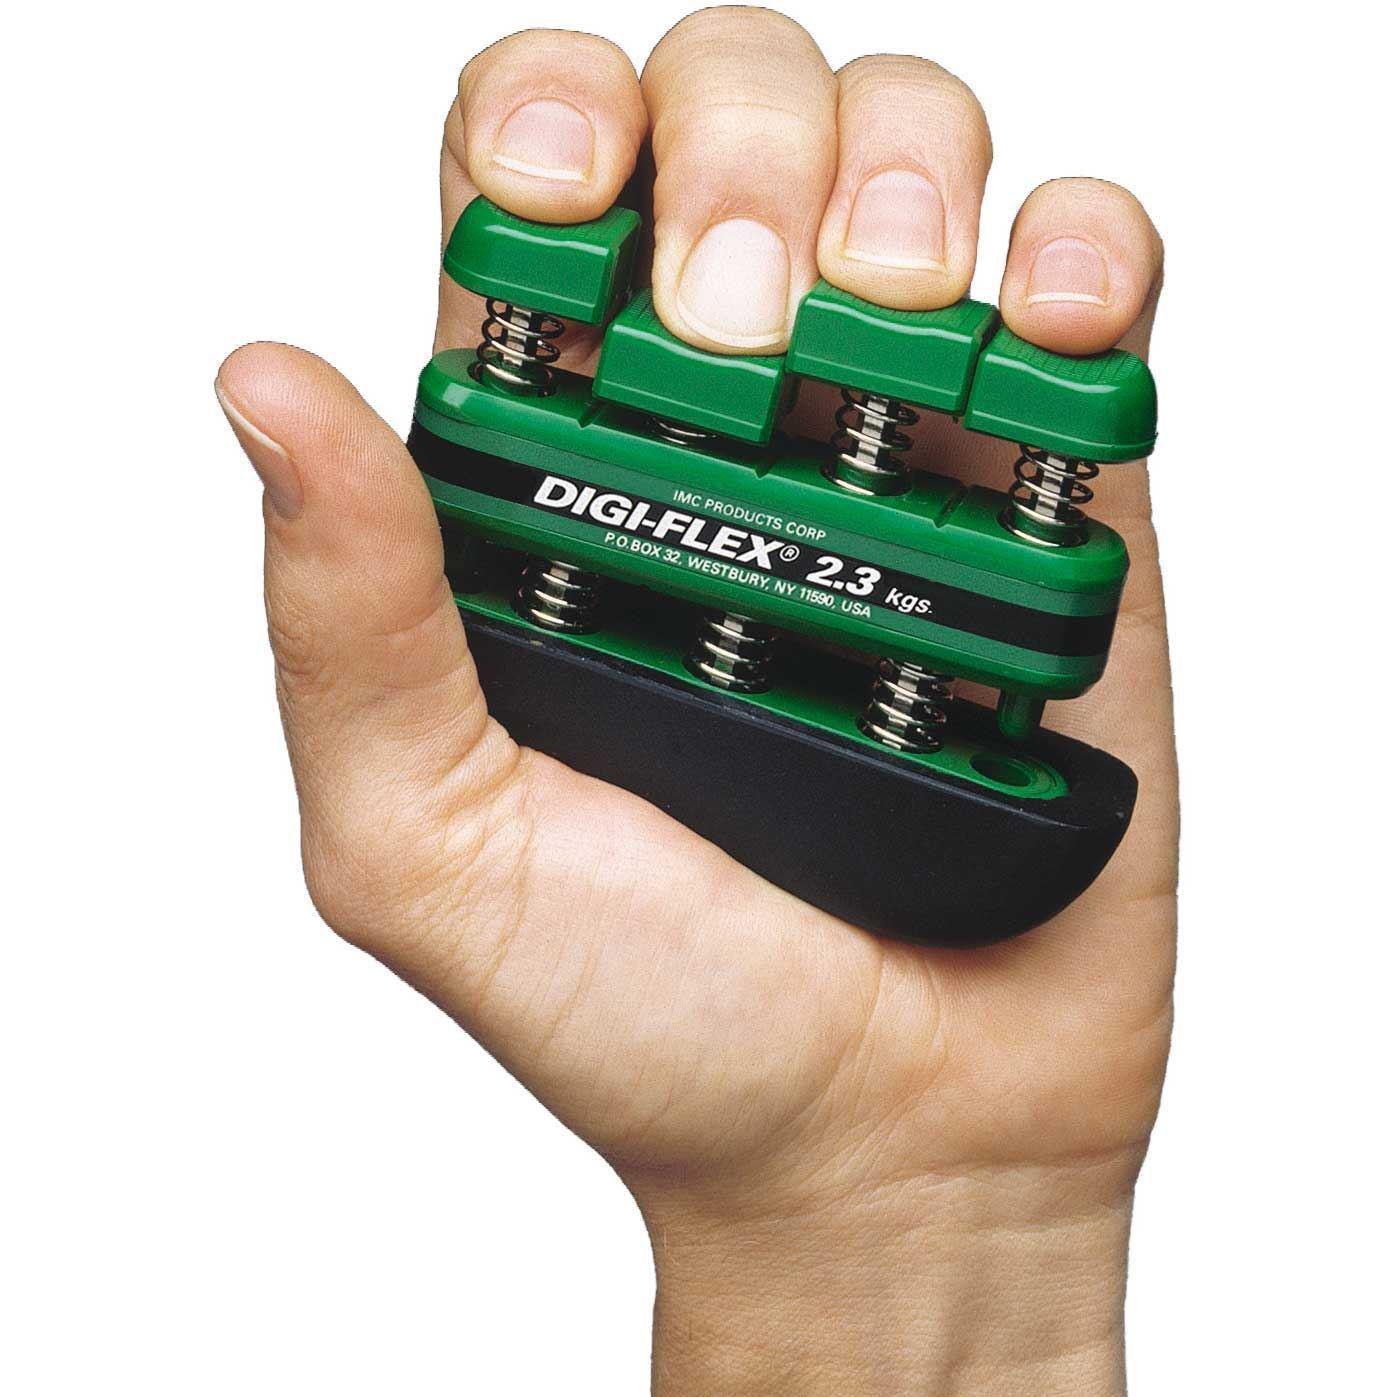 DIGIFLEX GREEN 2.3 - 7.3 KG